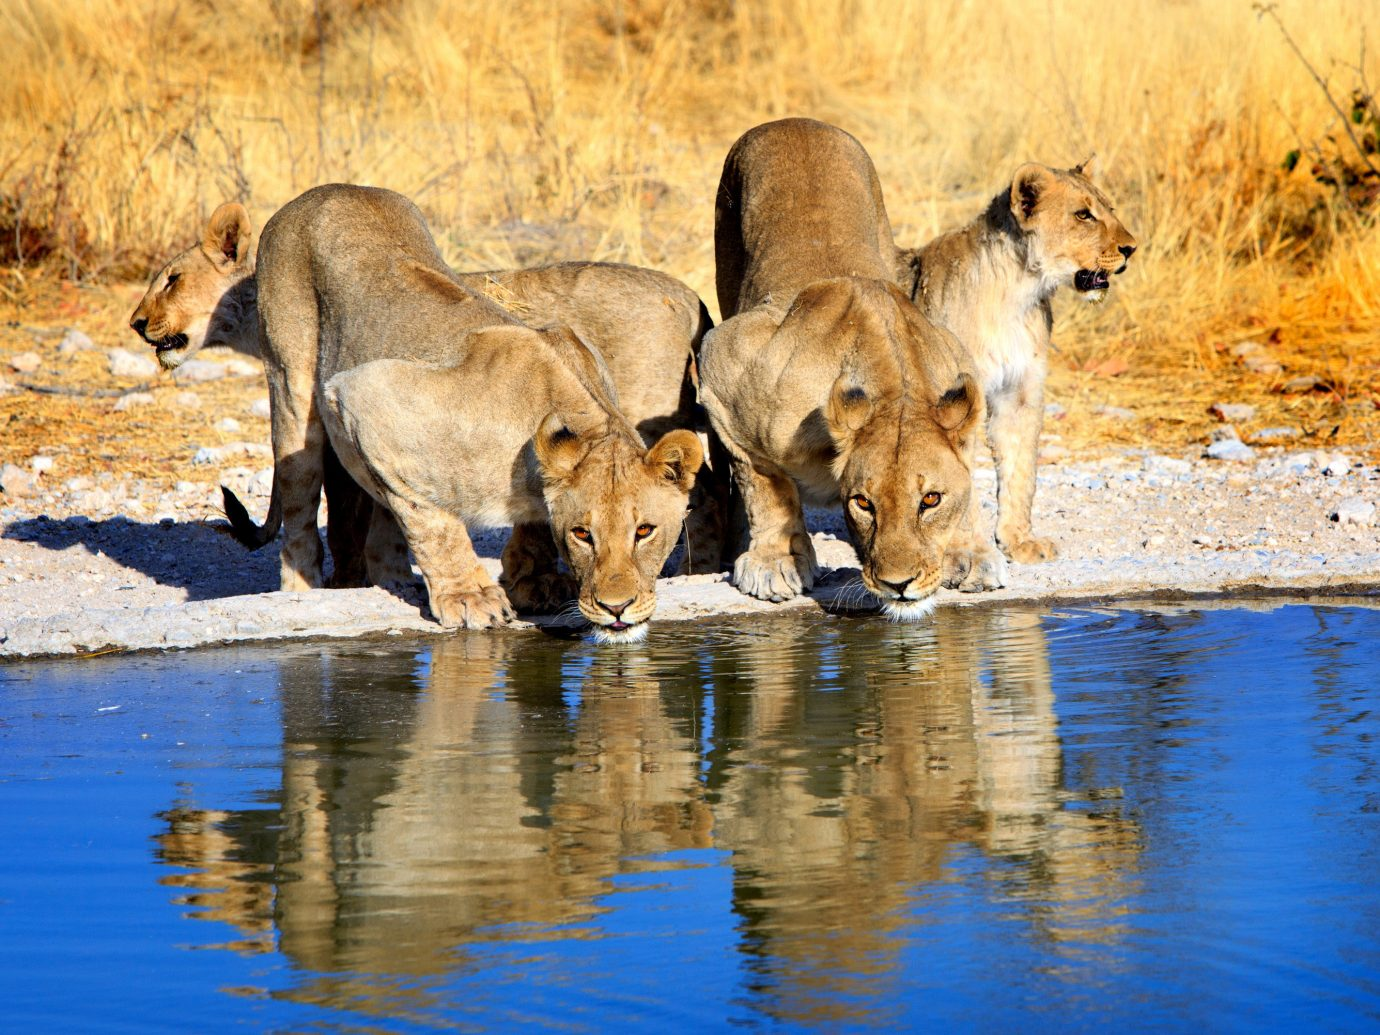 africa Honeymoon Namibia Romance Trip Ideas water animal Wildlife outdoor mammal Lion fauna wilderness reflection Safari terrestrial animal drinking masai lion savanna big cats snout grassland Drink pond Family several